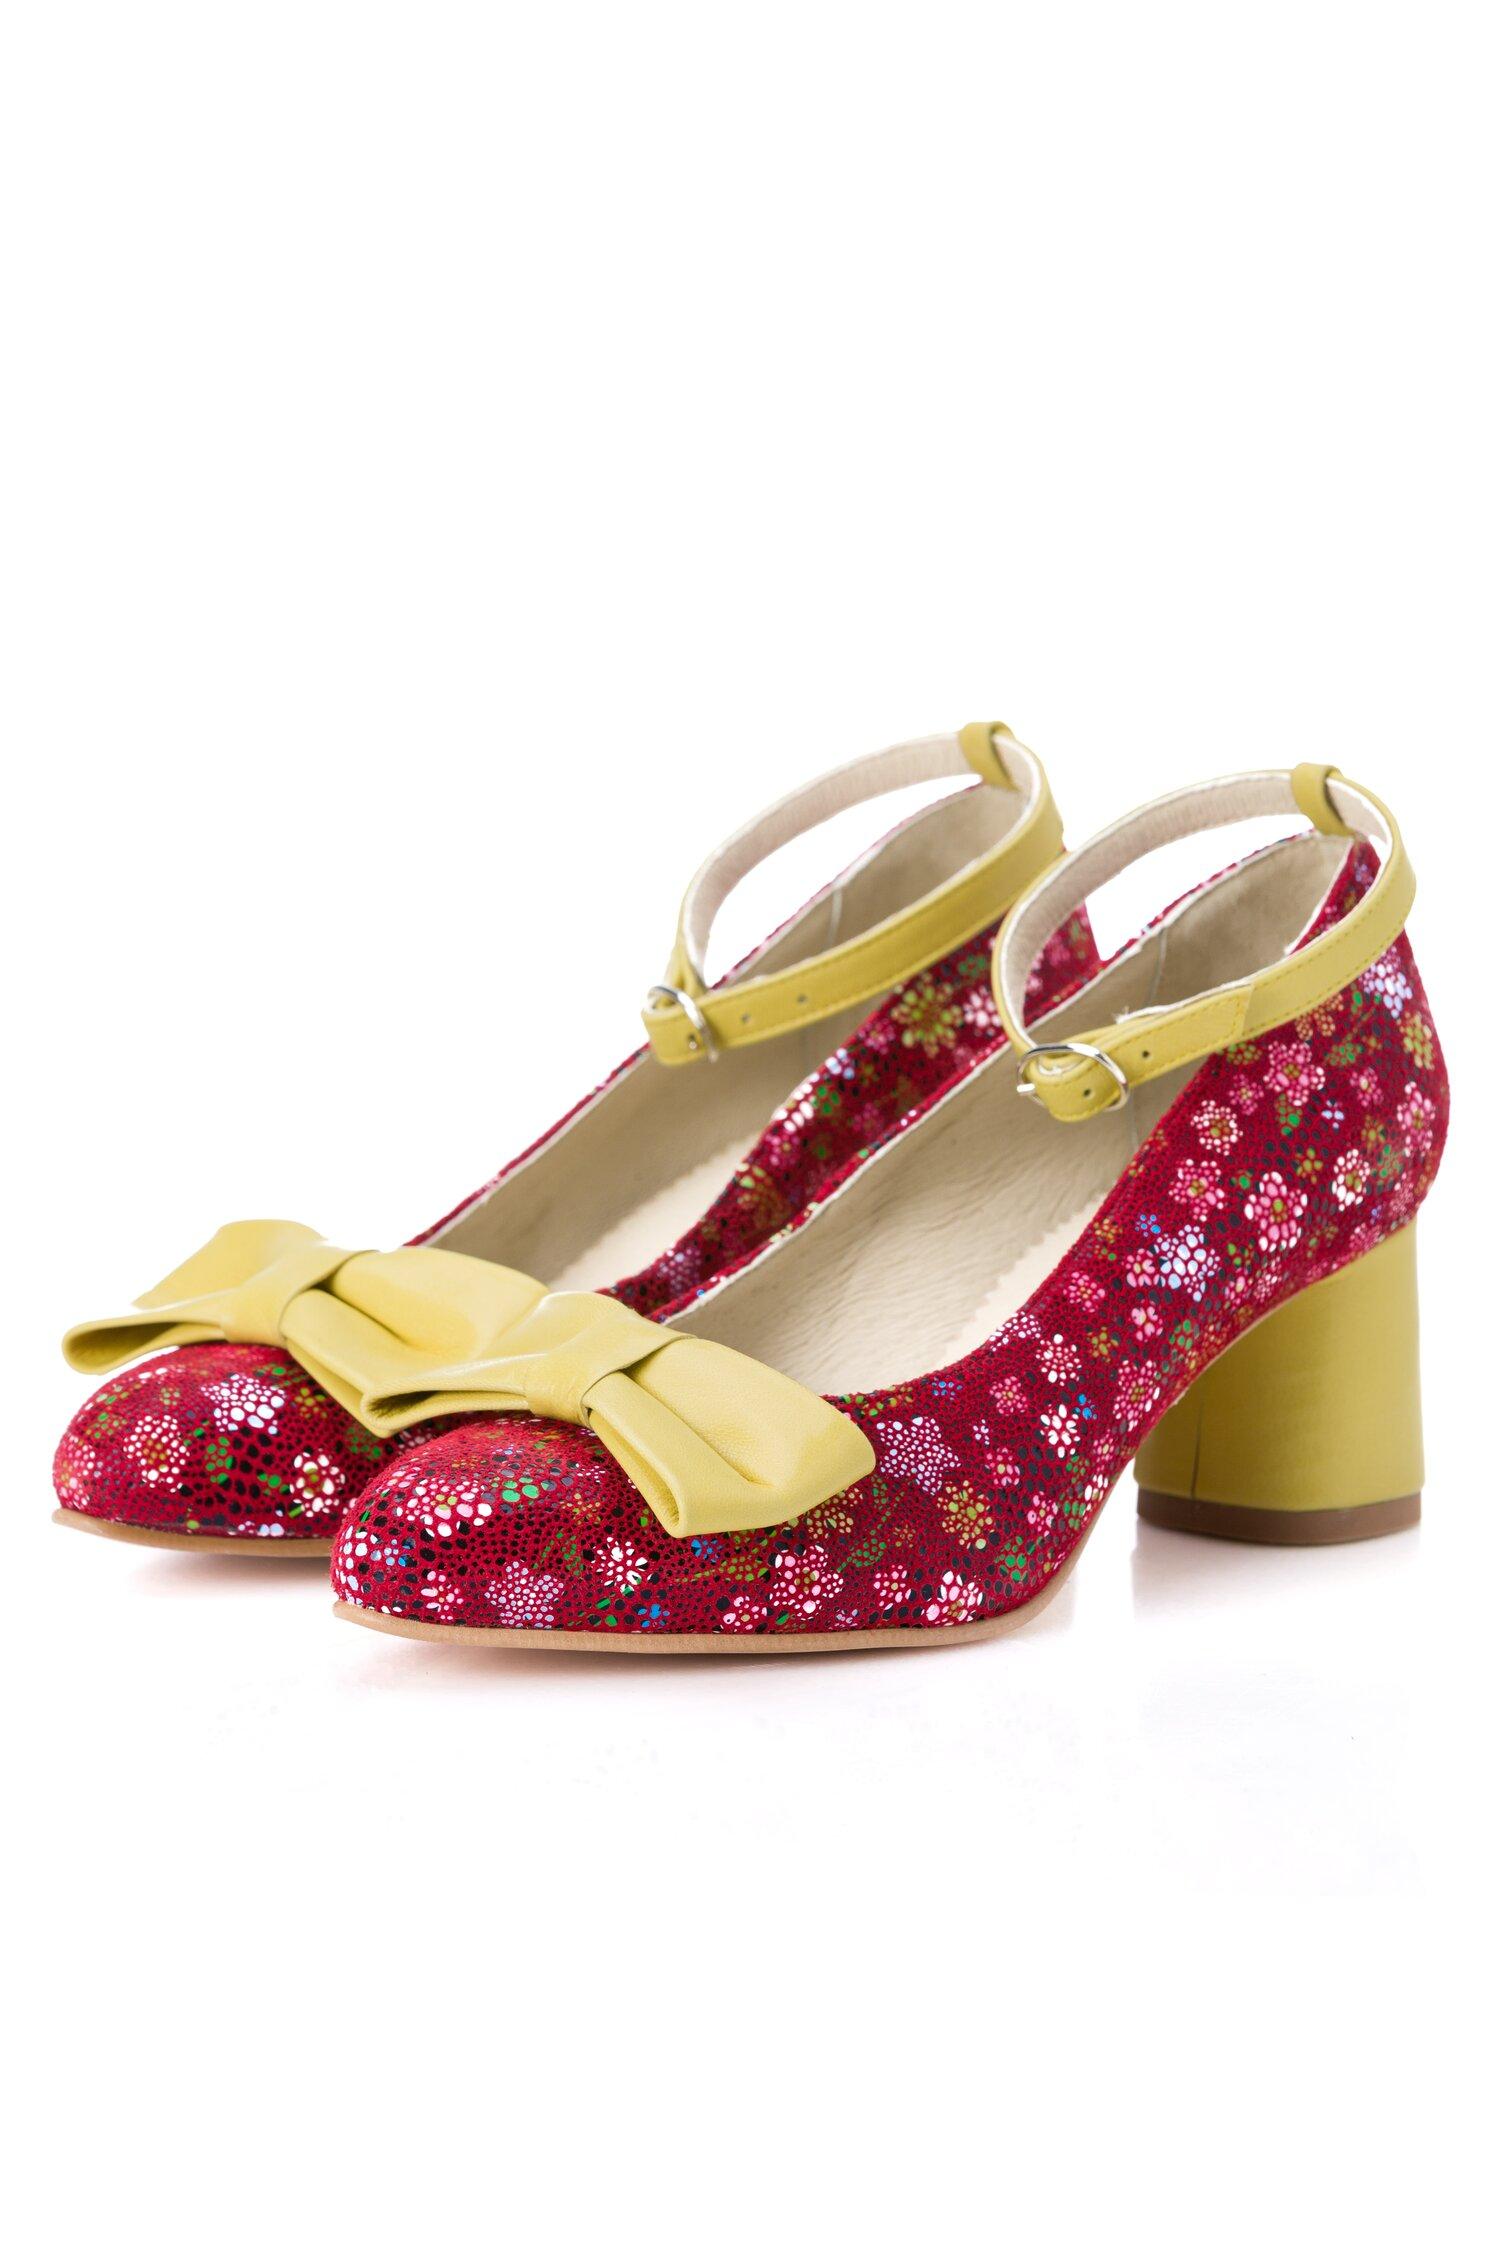 Pantofi rosii cu imprimeuri florale cu bareta si fundita galbene imagine